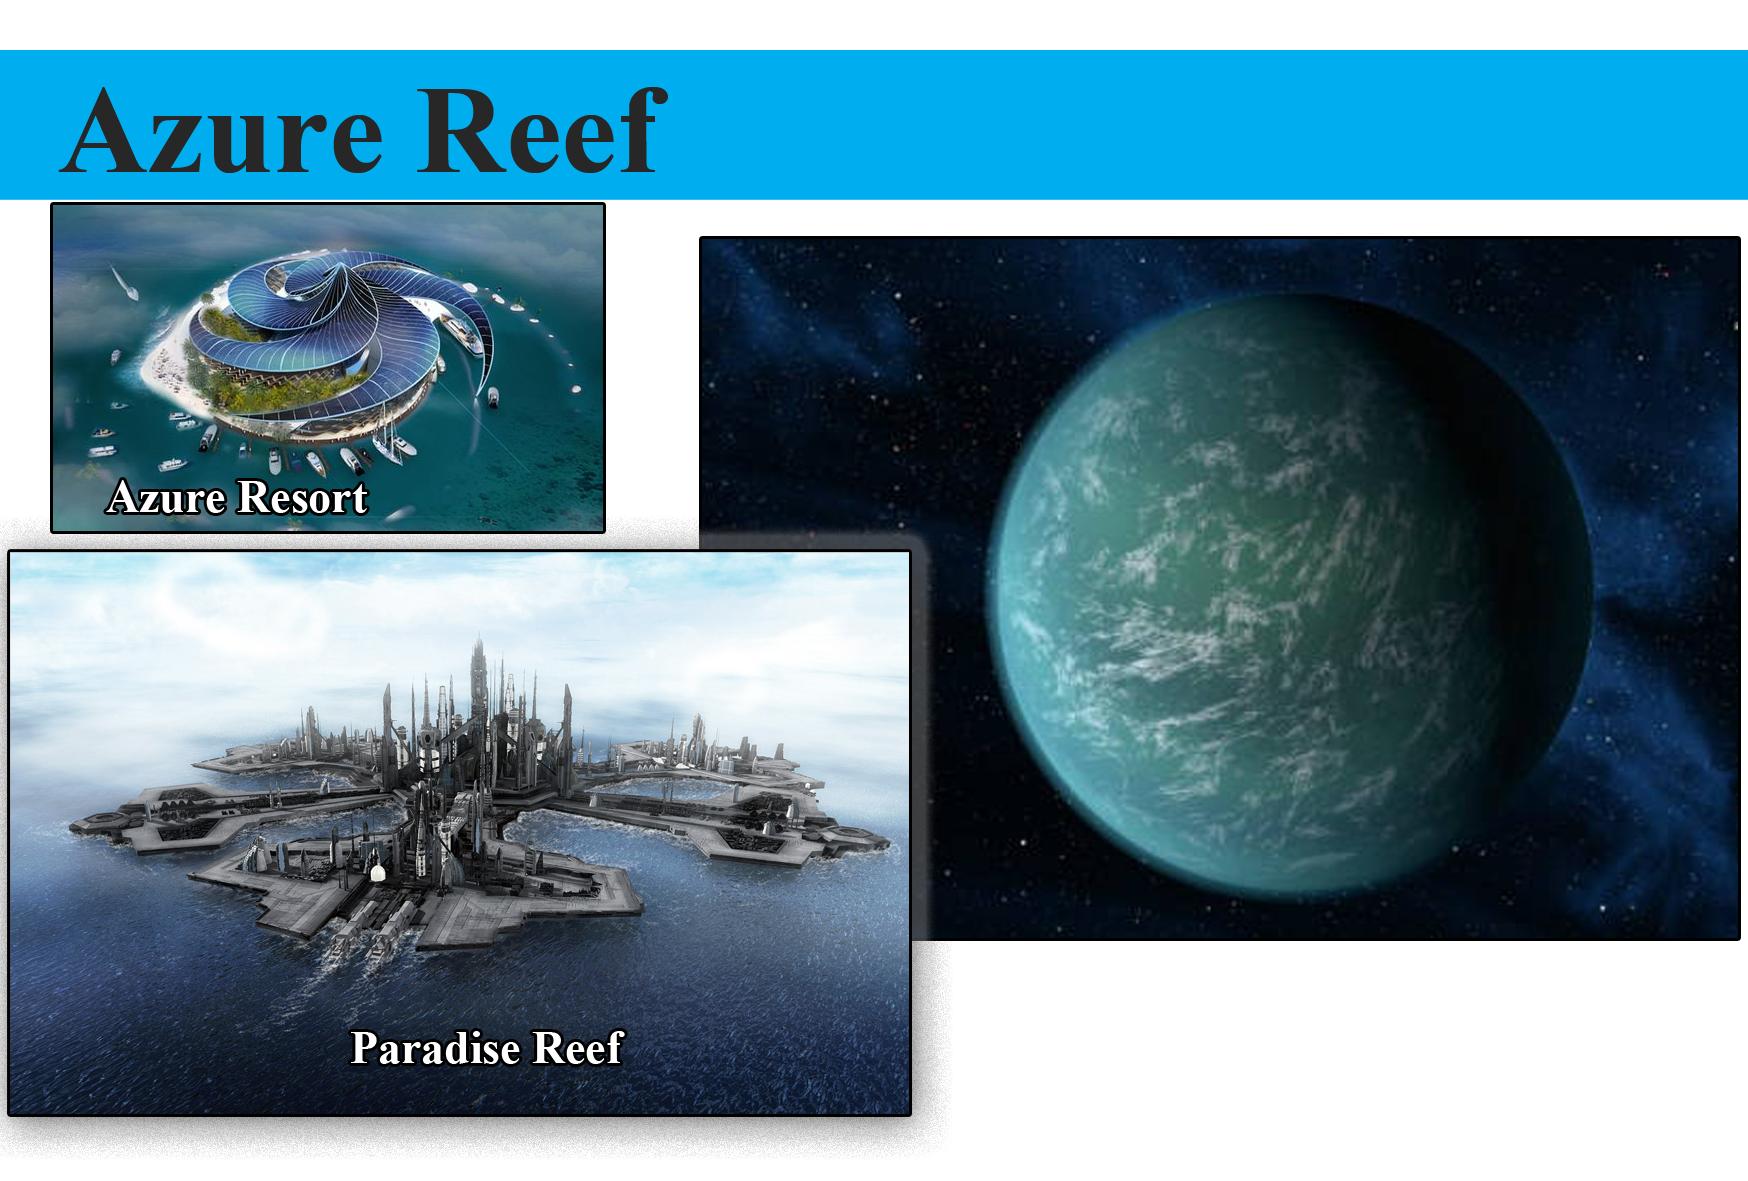 Azure Reef